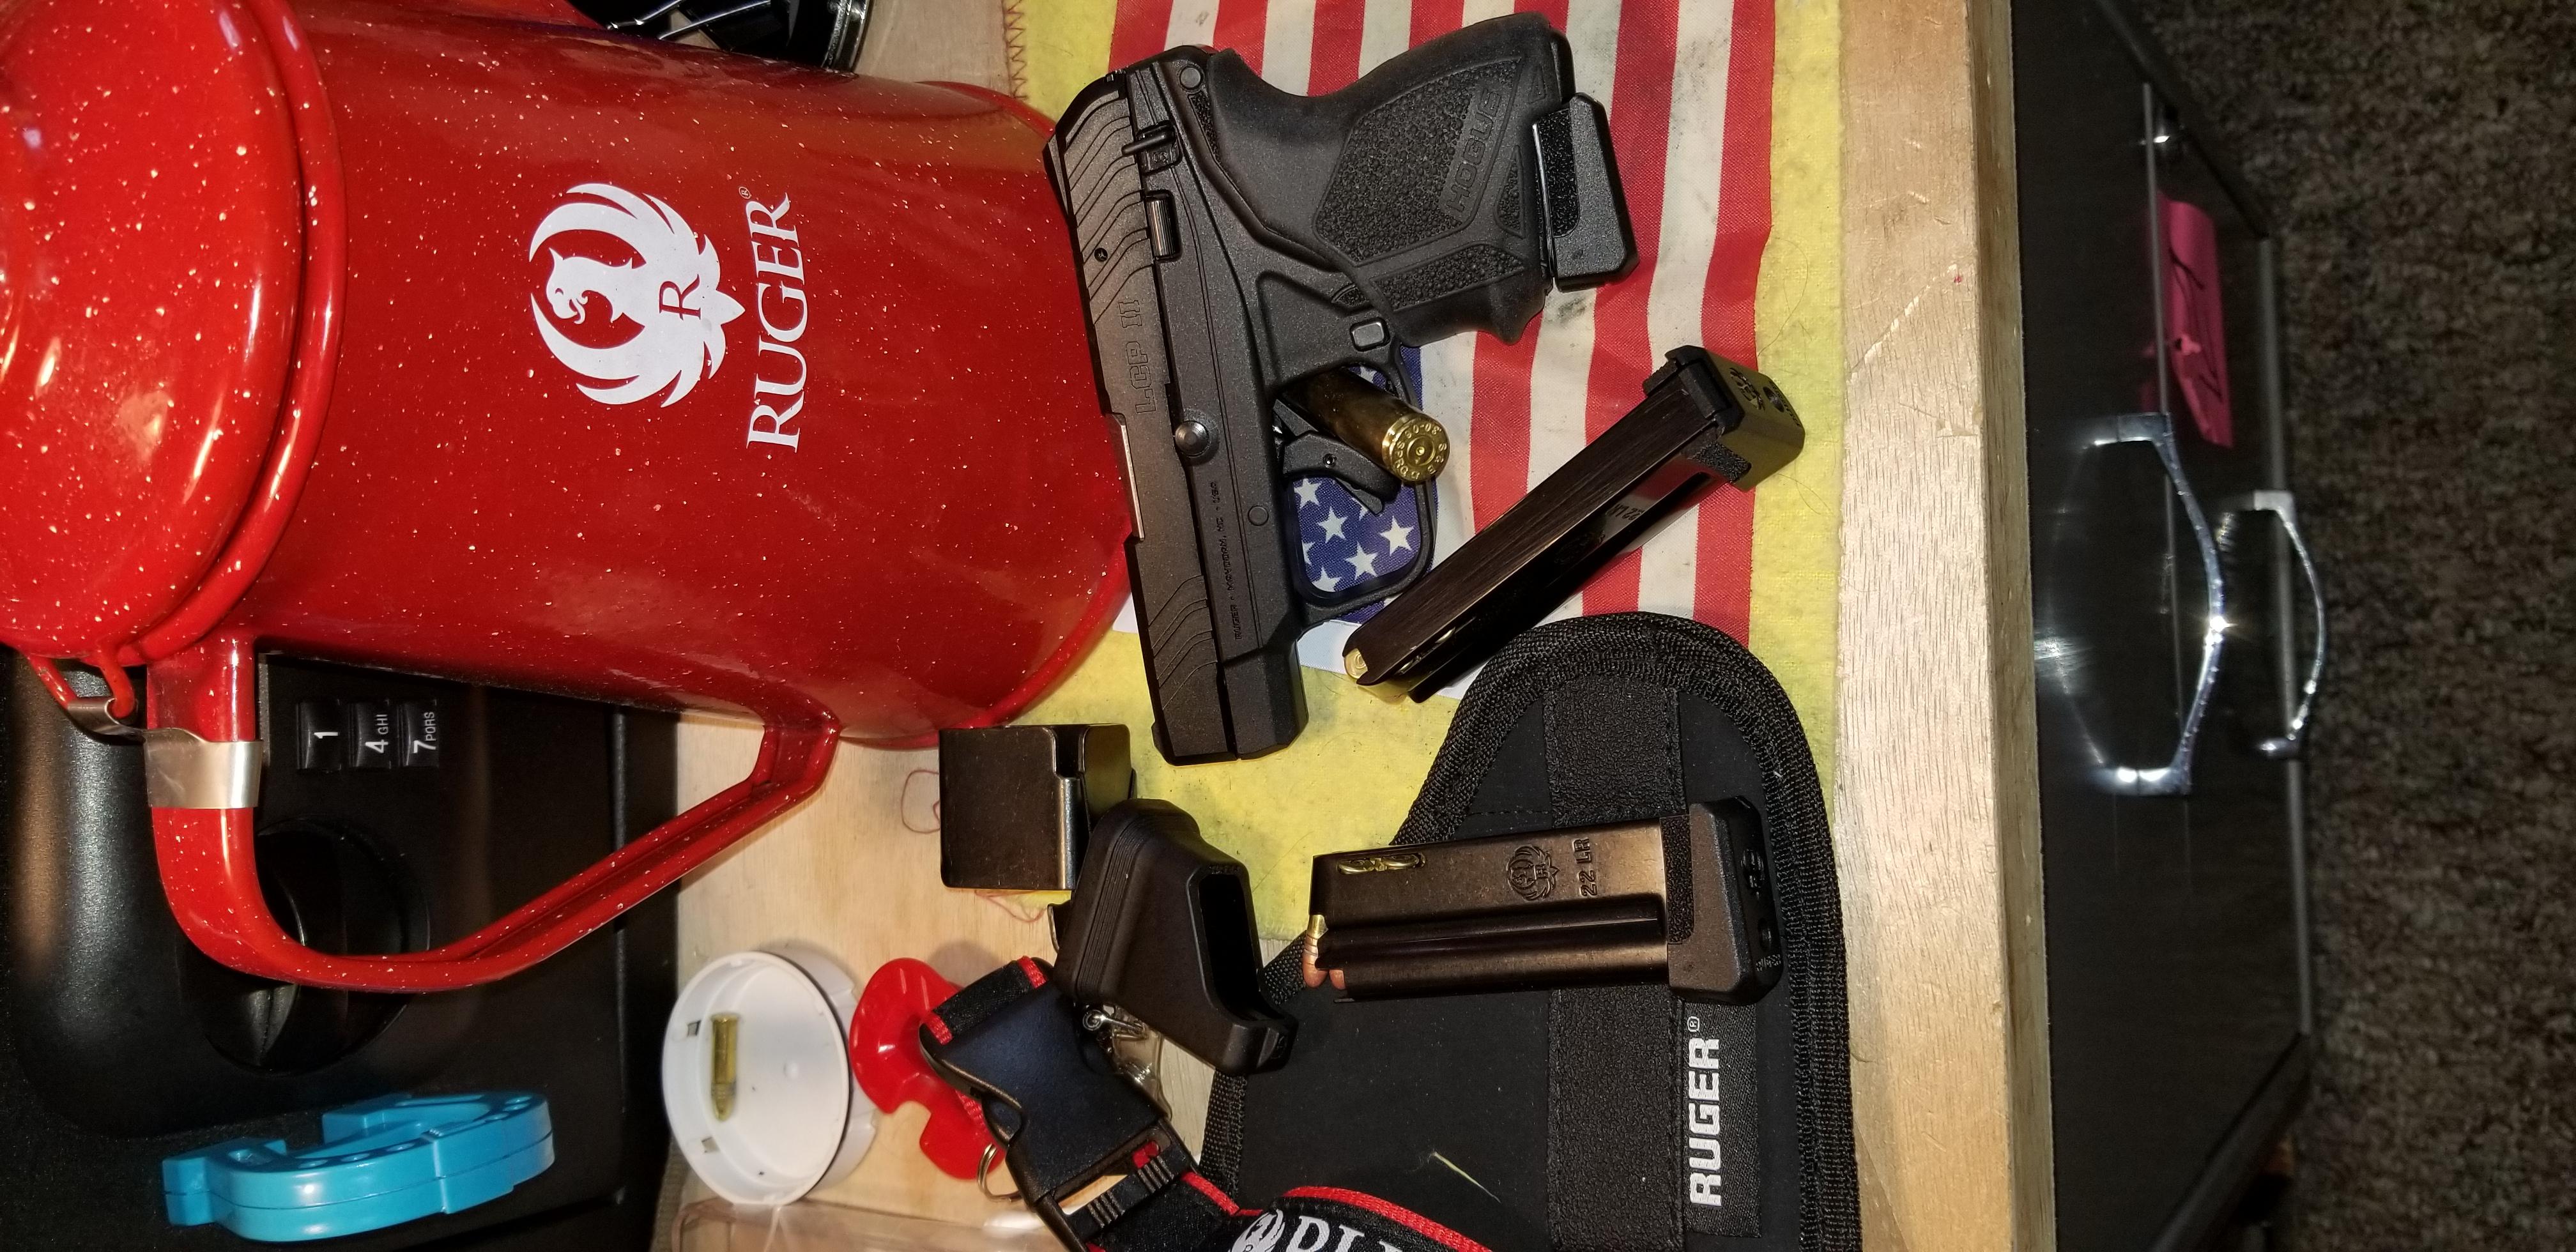 LCPII 22LR First ammo test.-a_lcpii22lr_w_grip.jpg